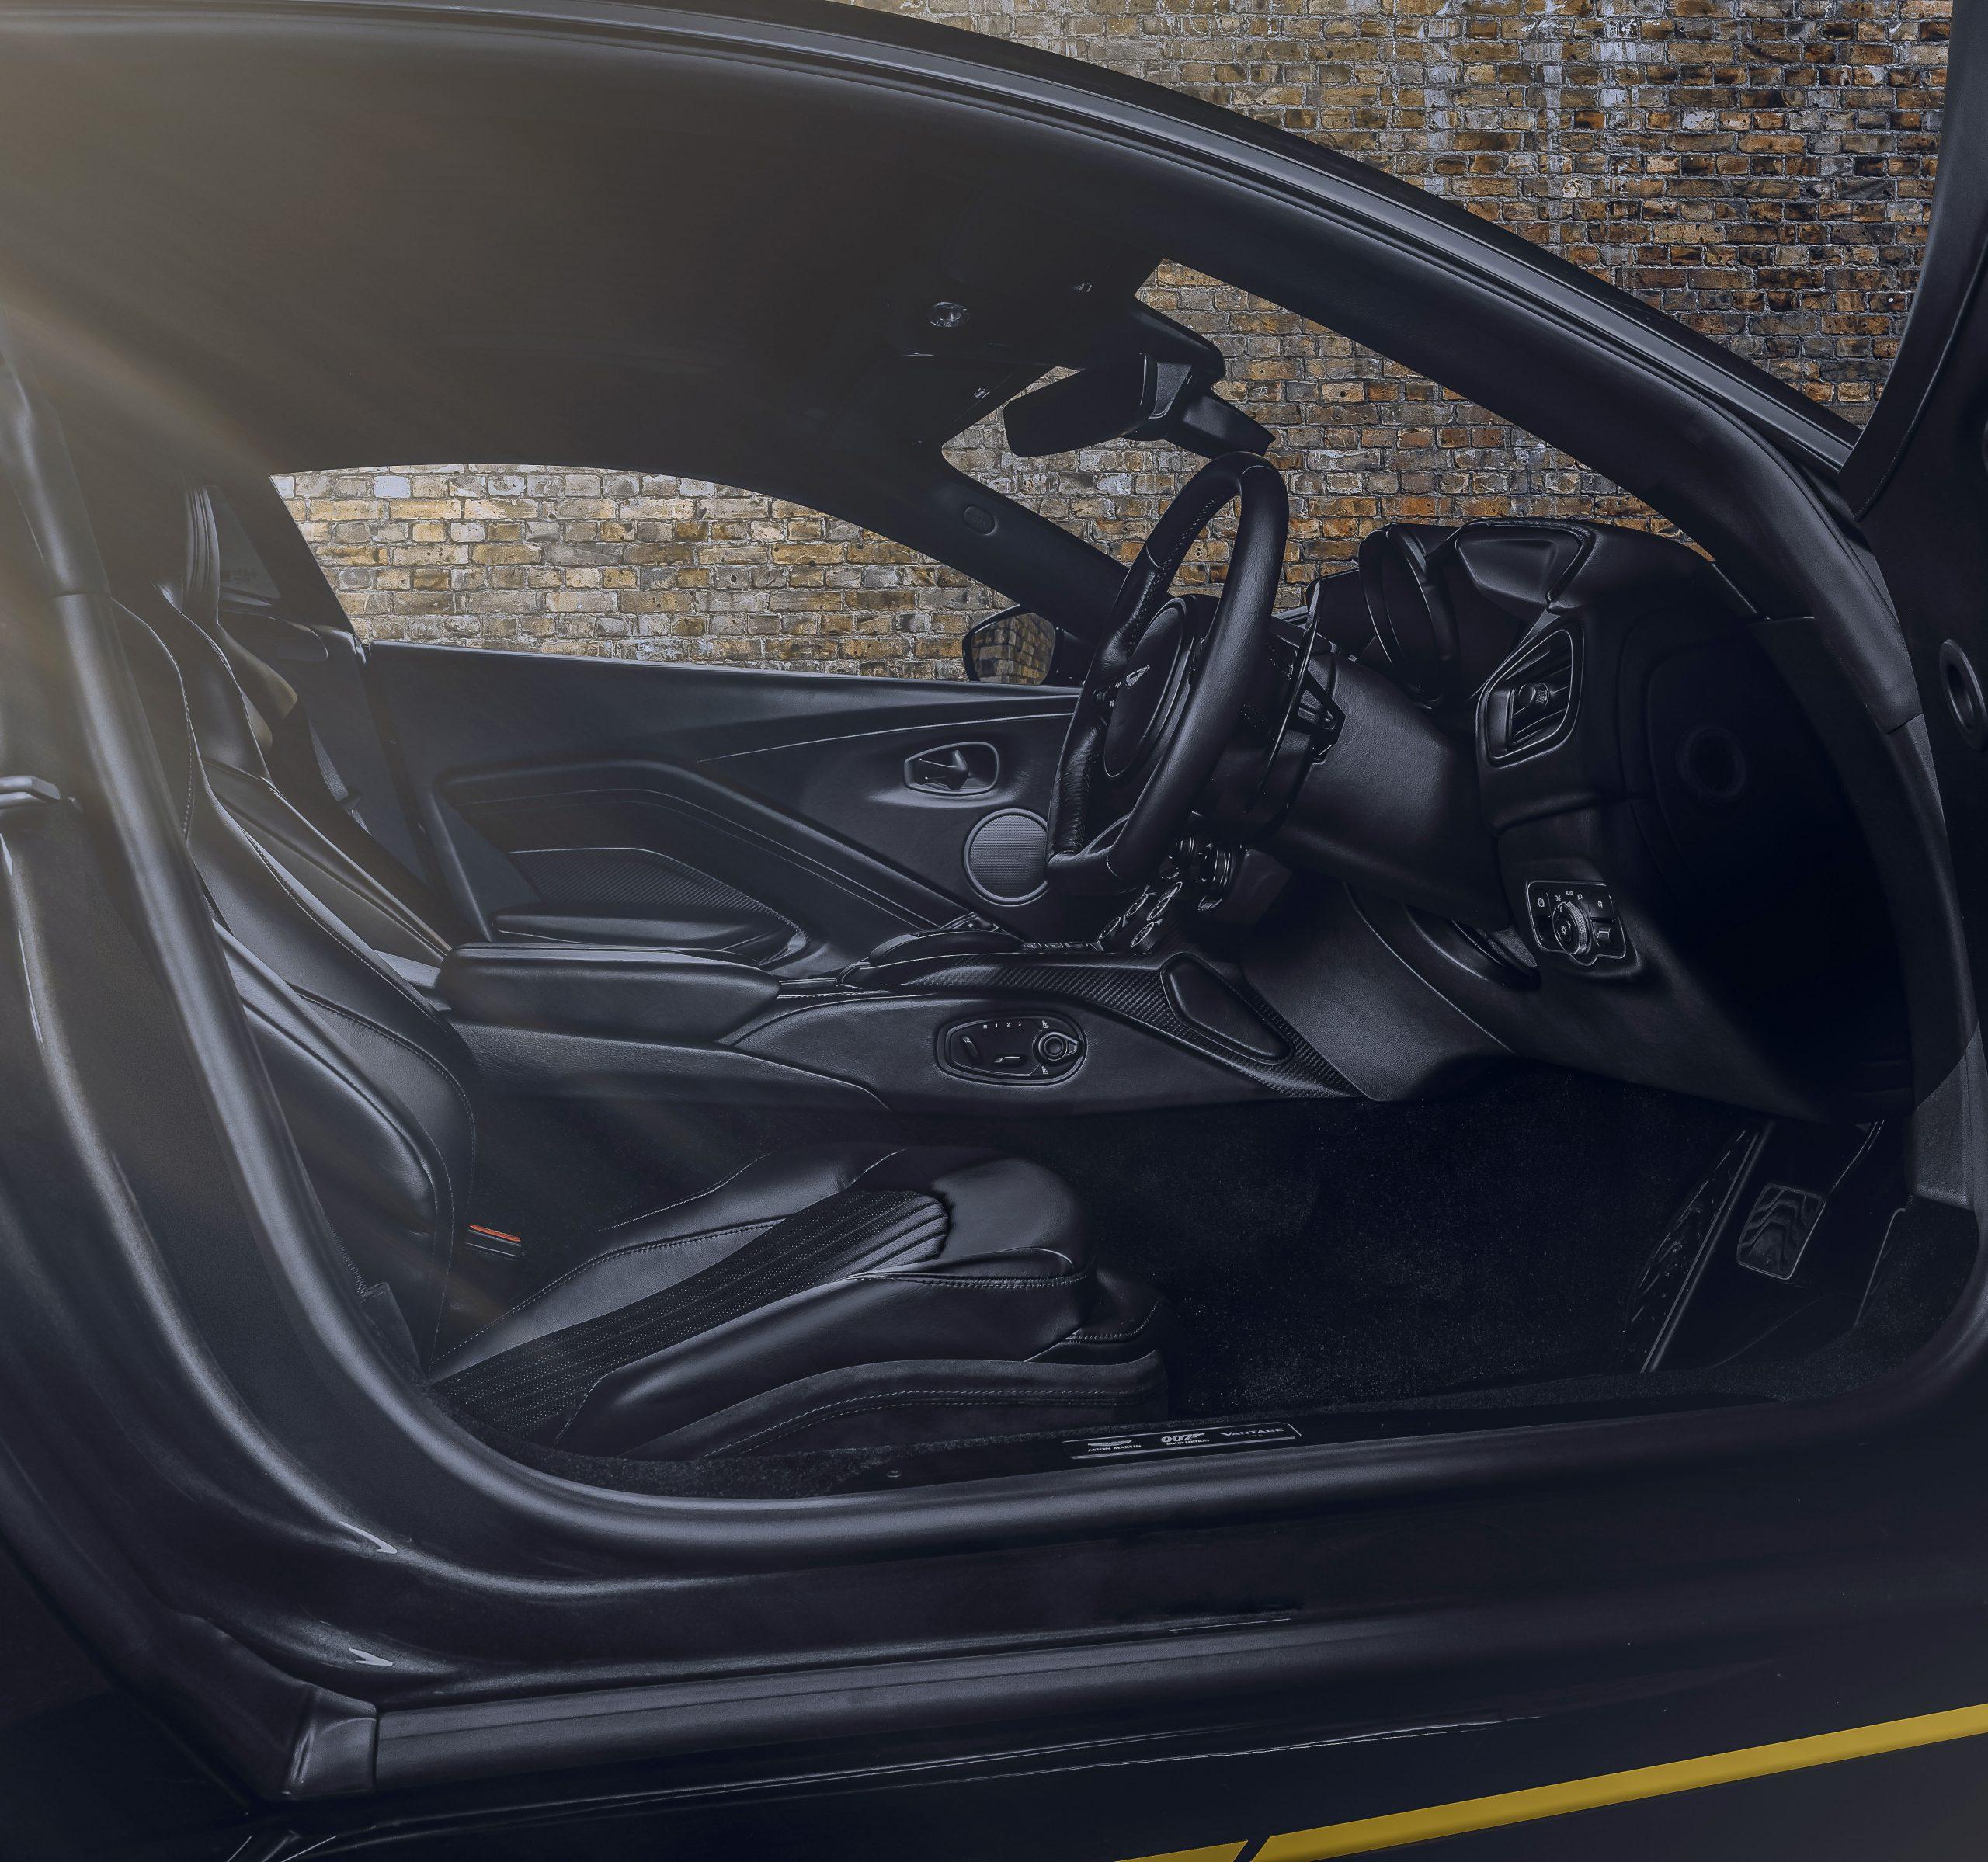 Aston Martin Vantage 007 Edition interior side